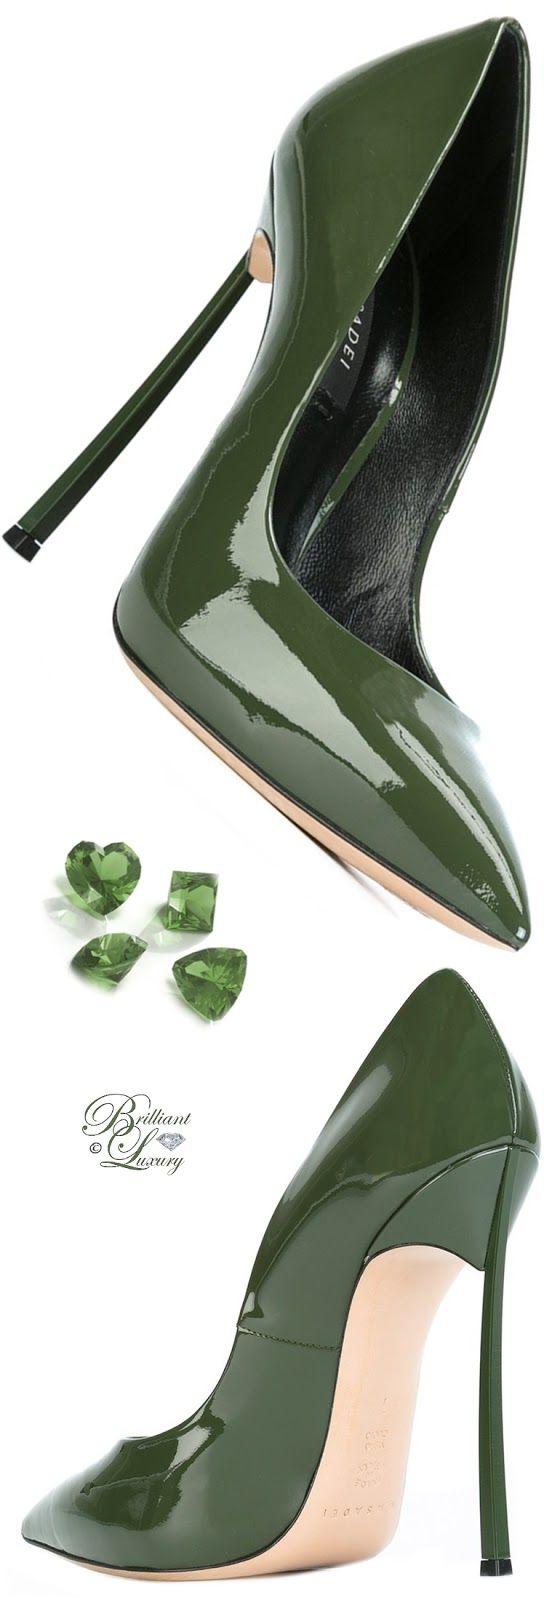 Brilliant Luxury ♦ Casadei Stiletto Heel Pumps